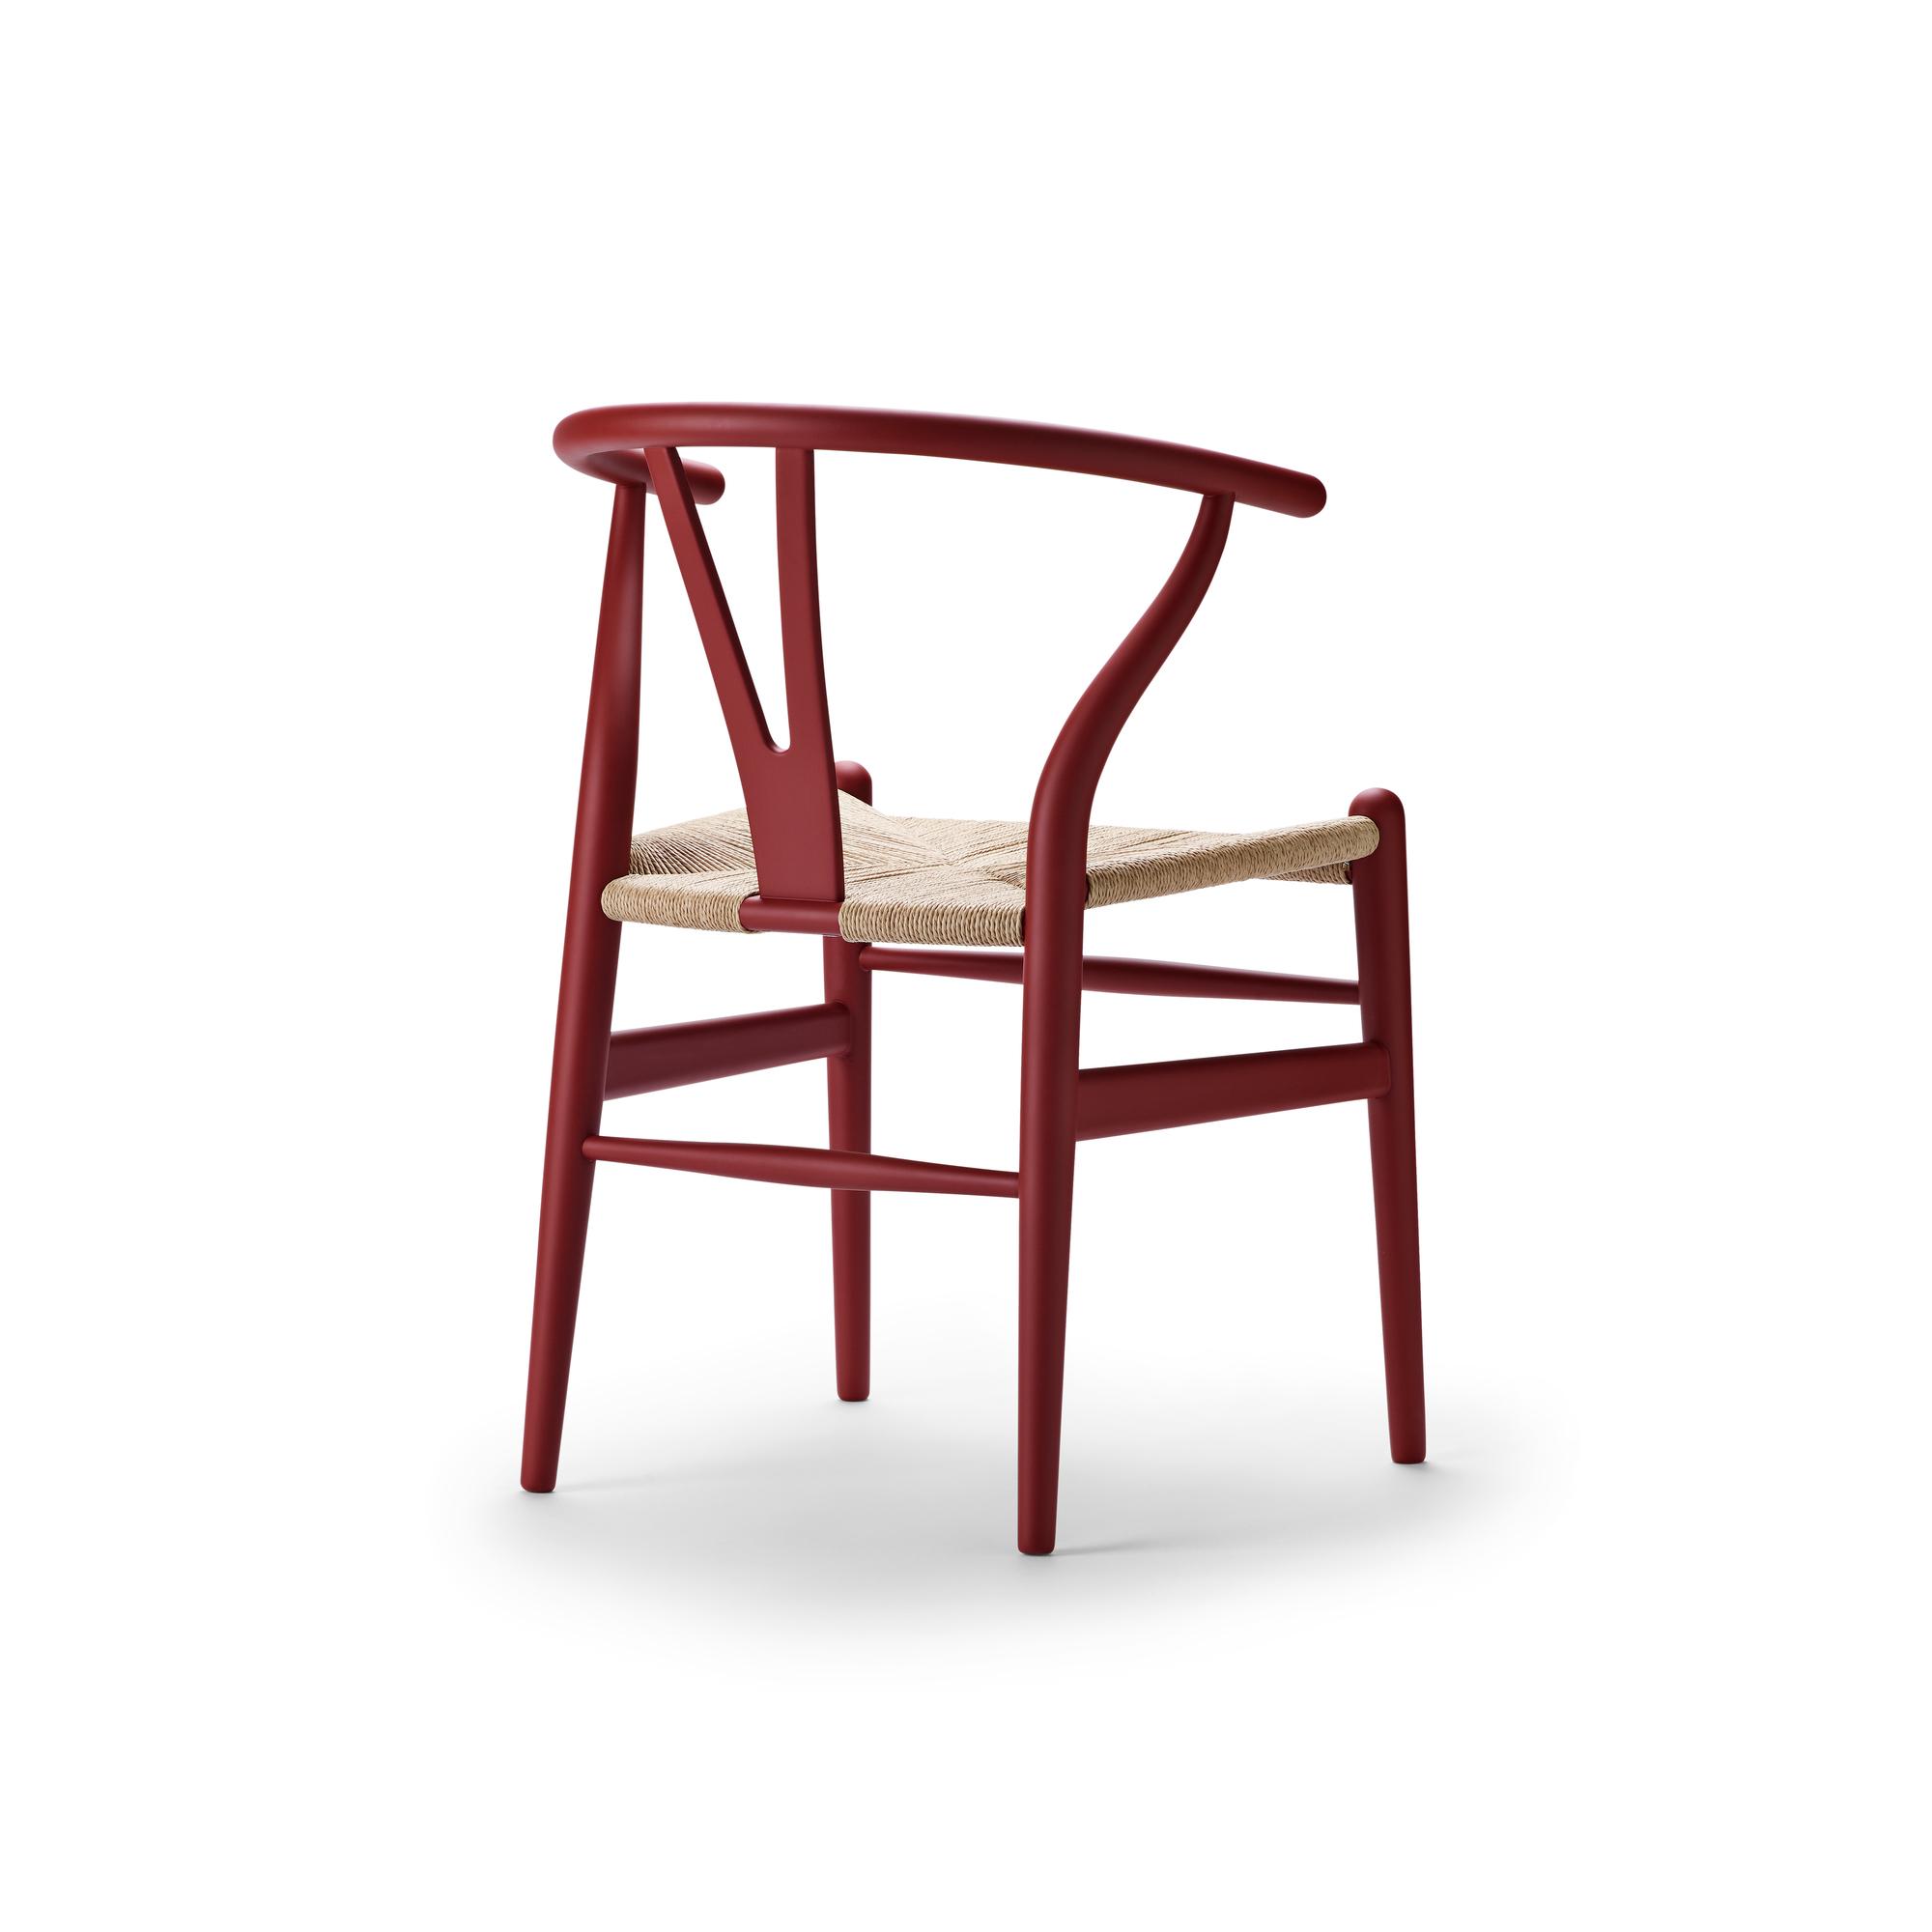 CH24 SOFT Wishbone Chair / Y-Chair Carl Hansen& Søn red